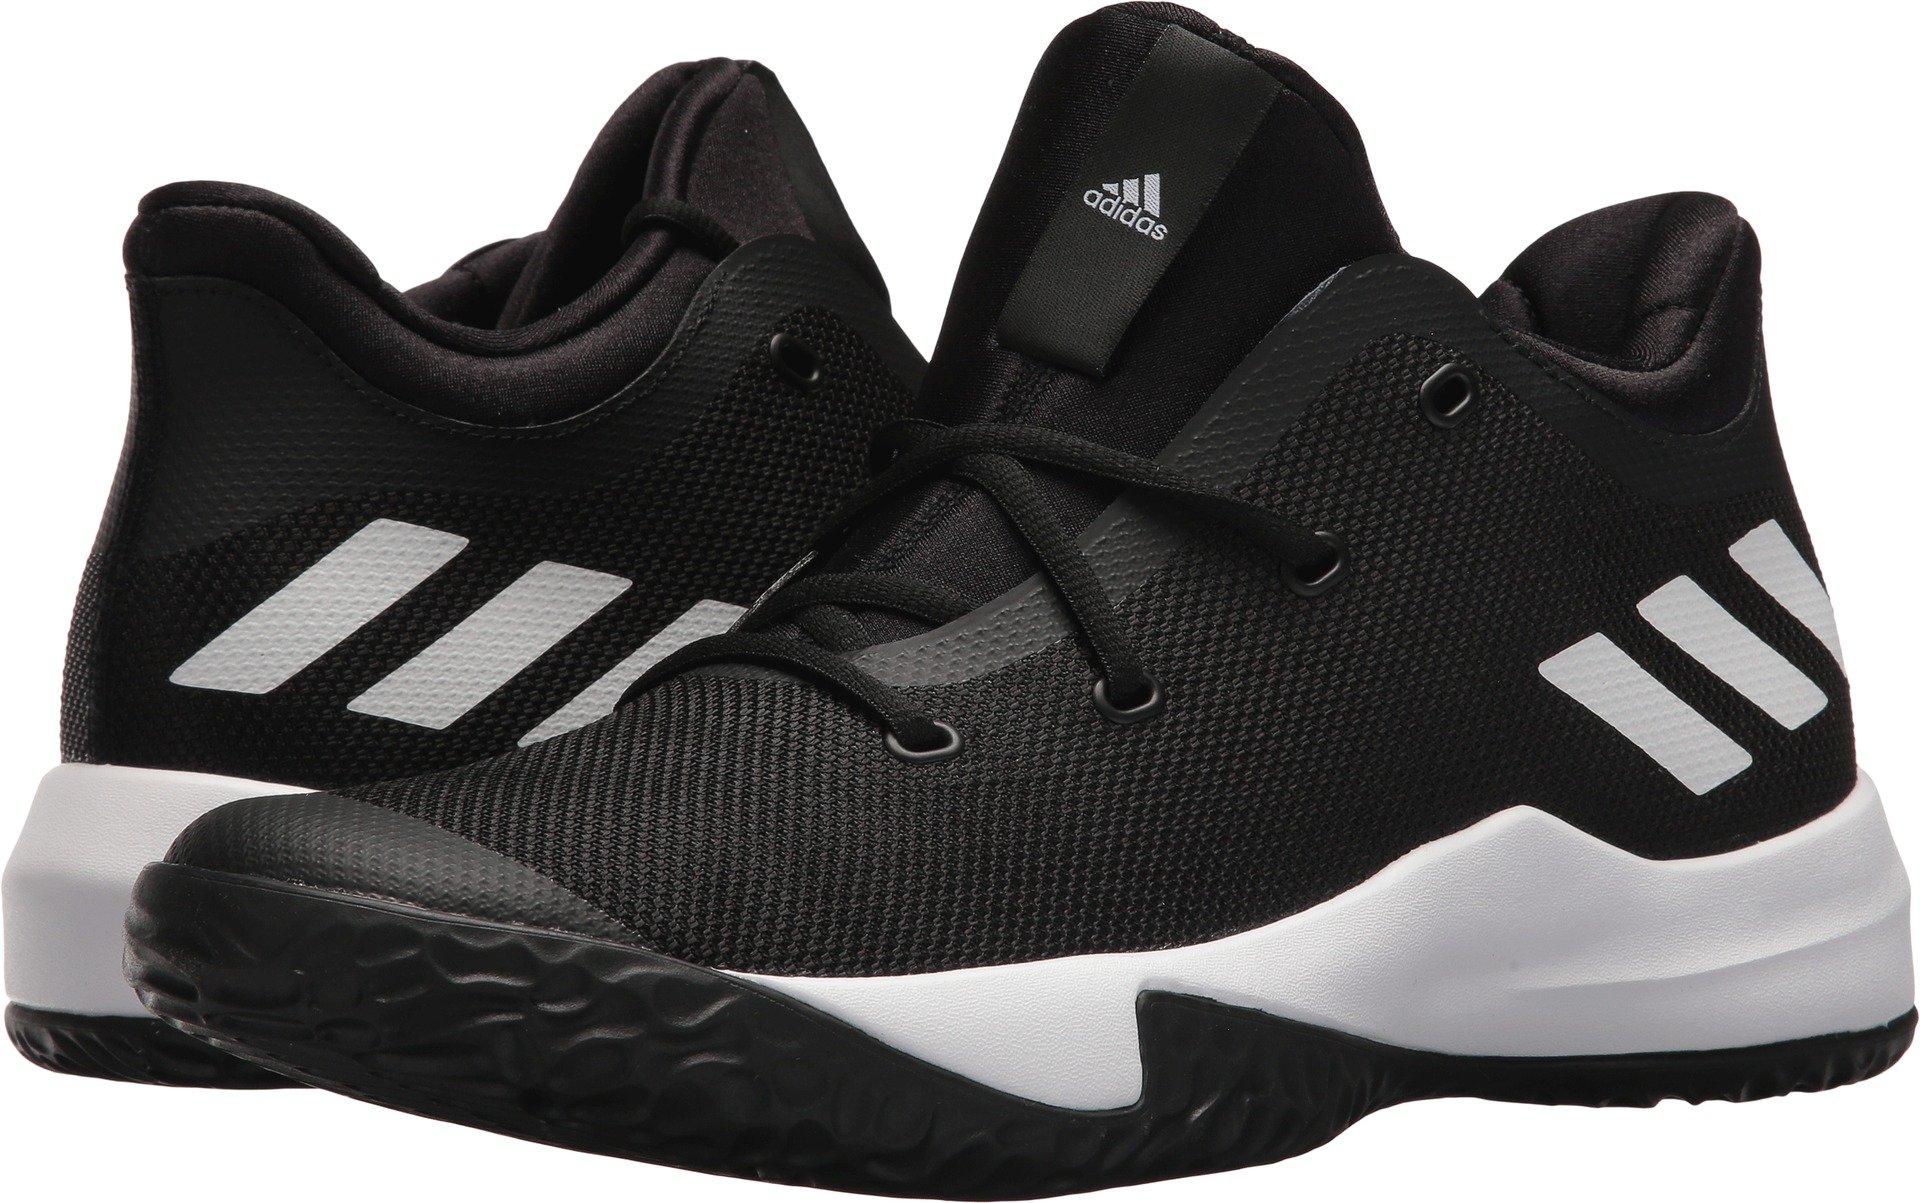 096dd0ac3514 Galleon - Adidas Performance Men s Rise Up 2 Basketball Shoe